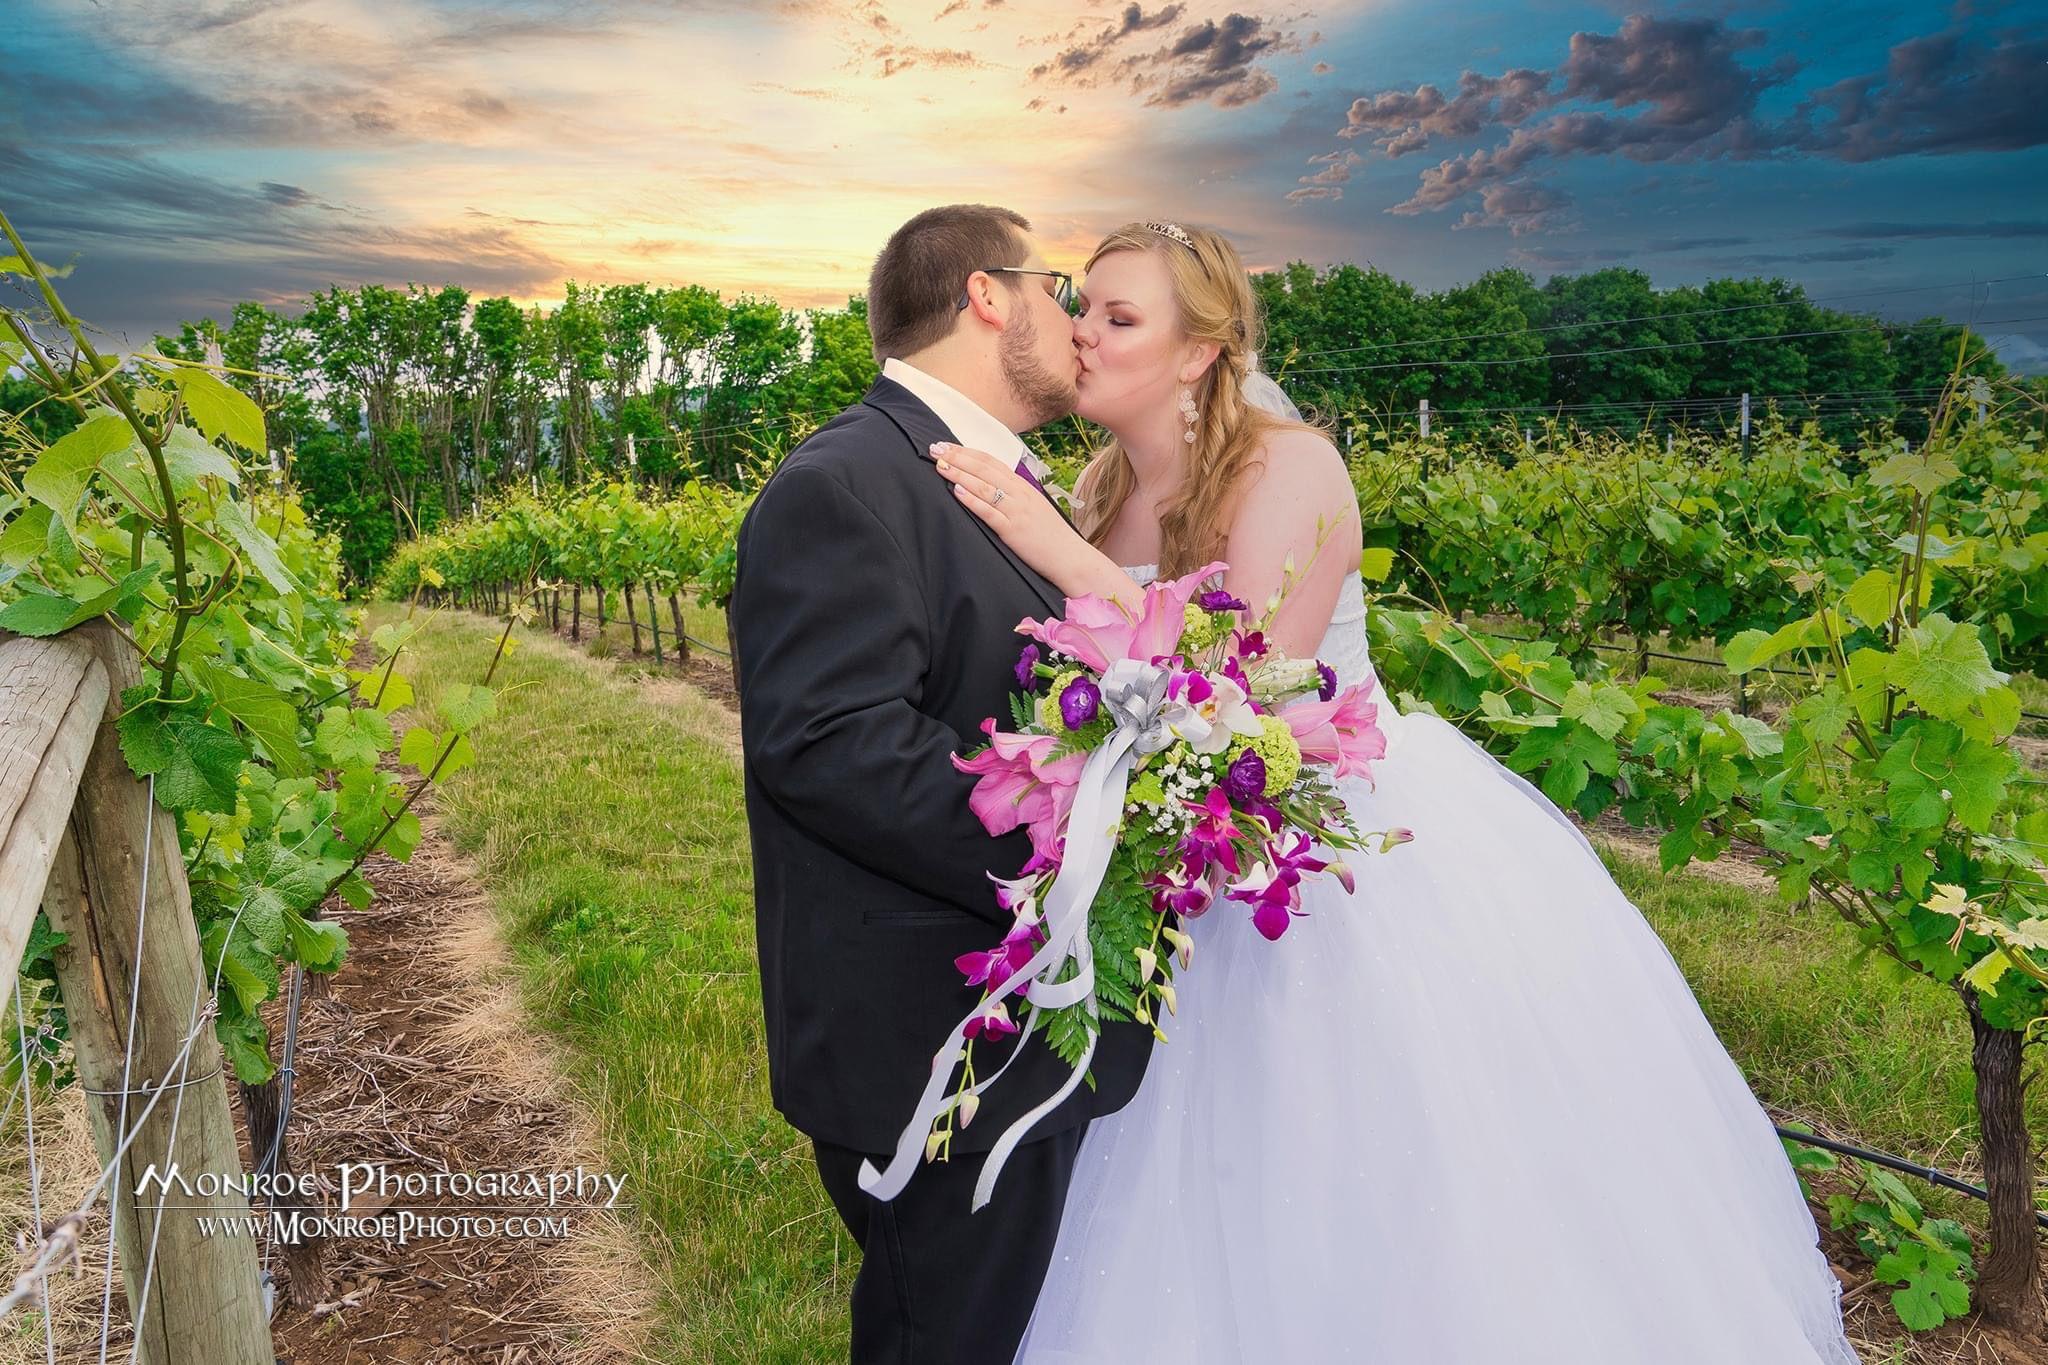 @salem oregon  #pnwphotographer #pnwedding #oregon #sonyalpha #sony #fairytail #tangled #weddingphoto #weddingpictures #weddingportraits